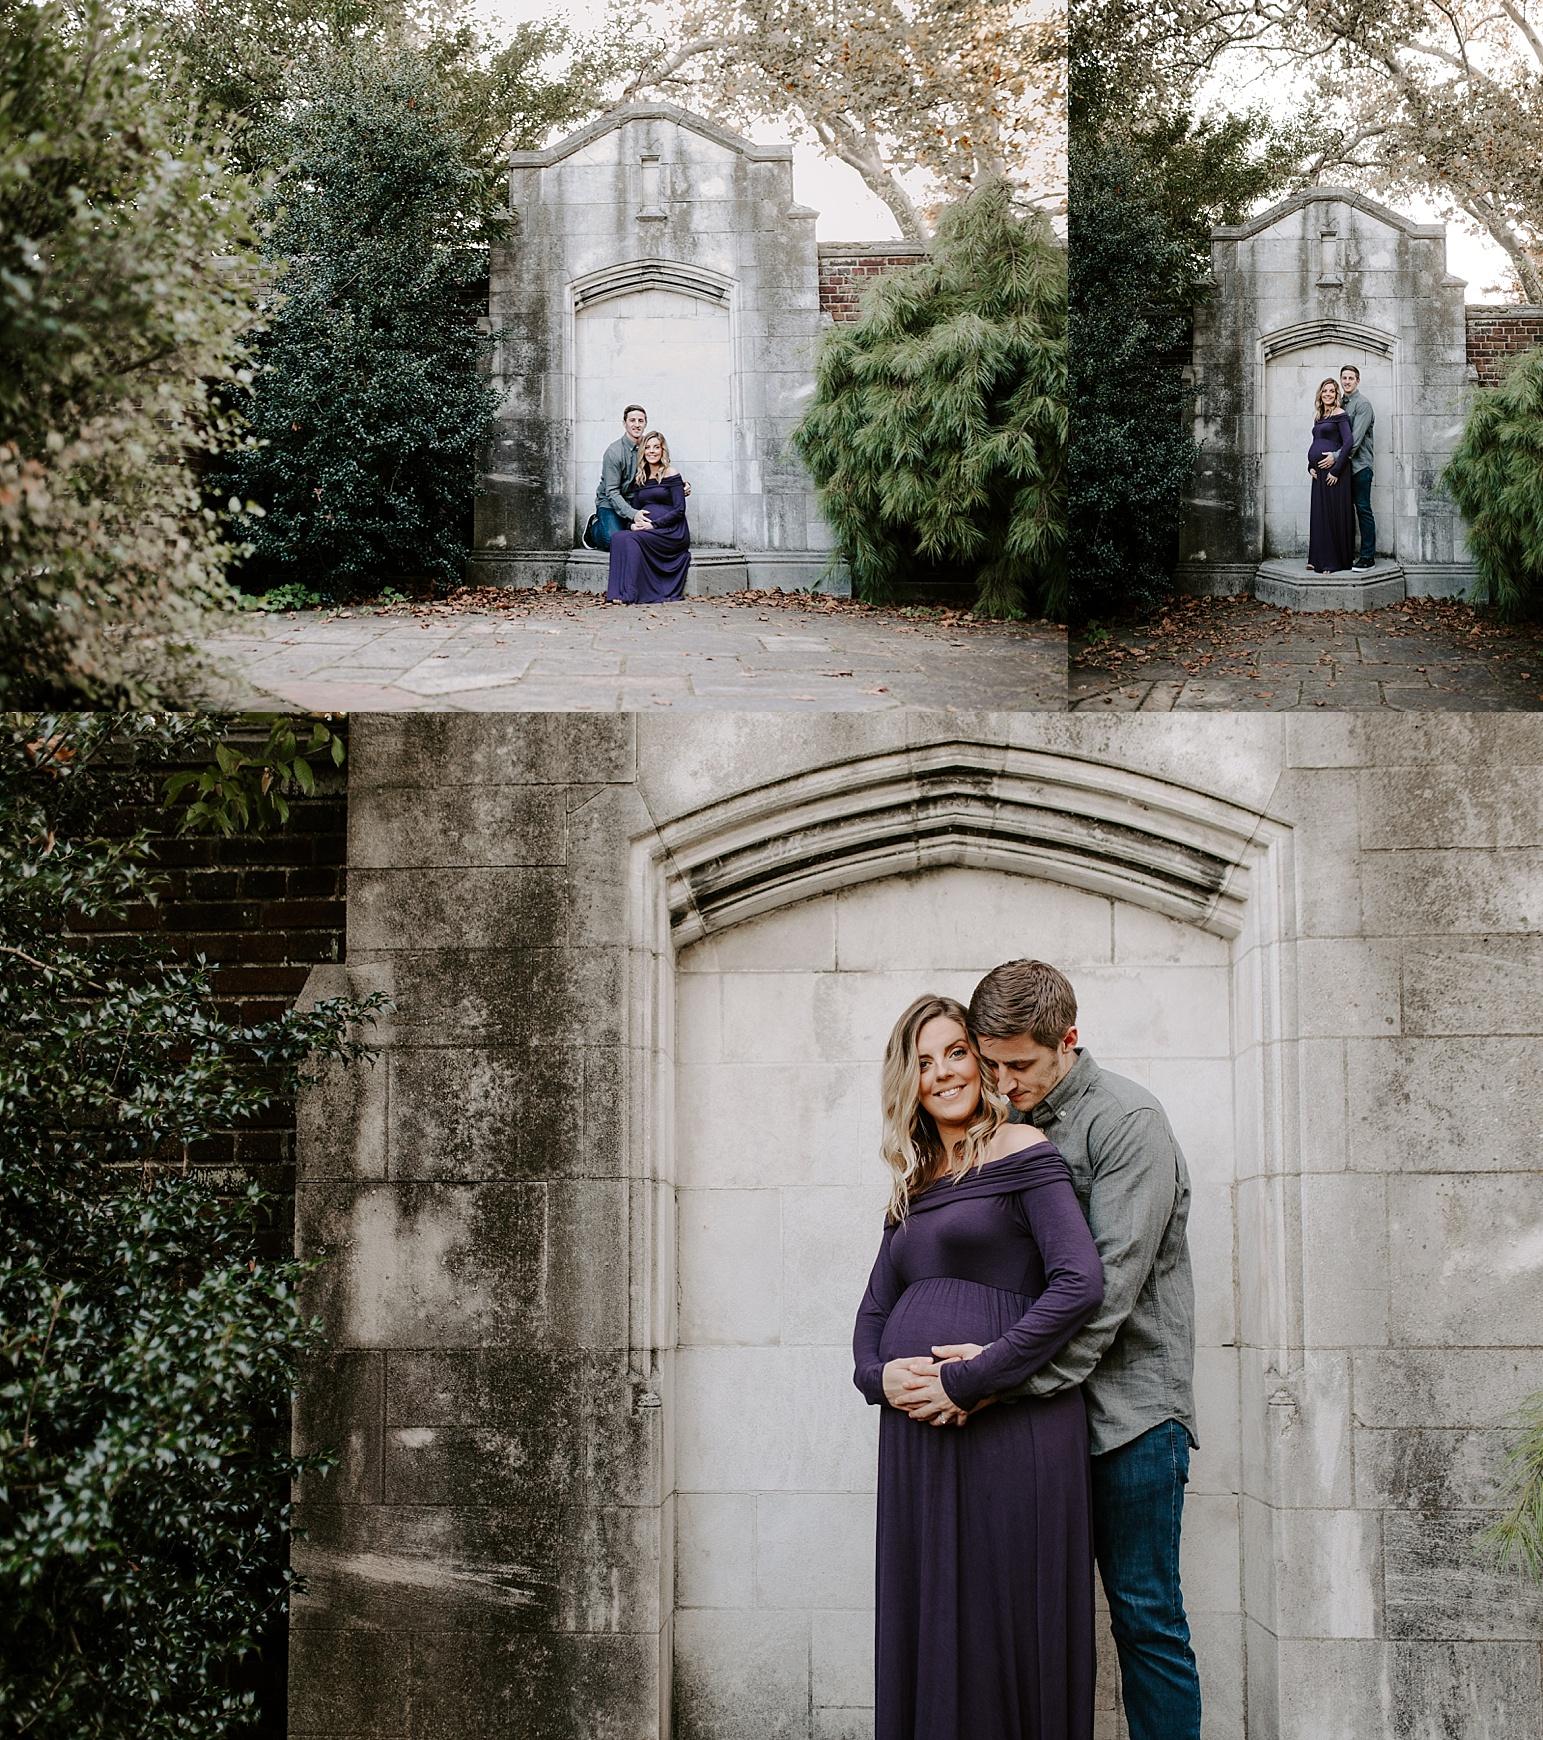 ashley_sara_photography-mellon-park-maternity-shoot-pittsburgh_photographer-maternity_photographer_pennsylvania9.jpg